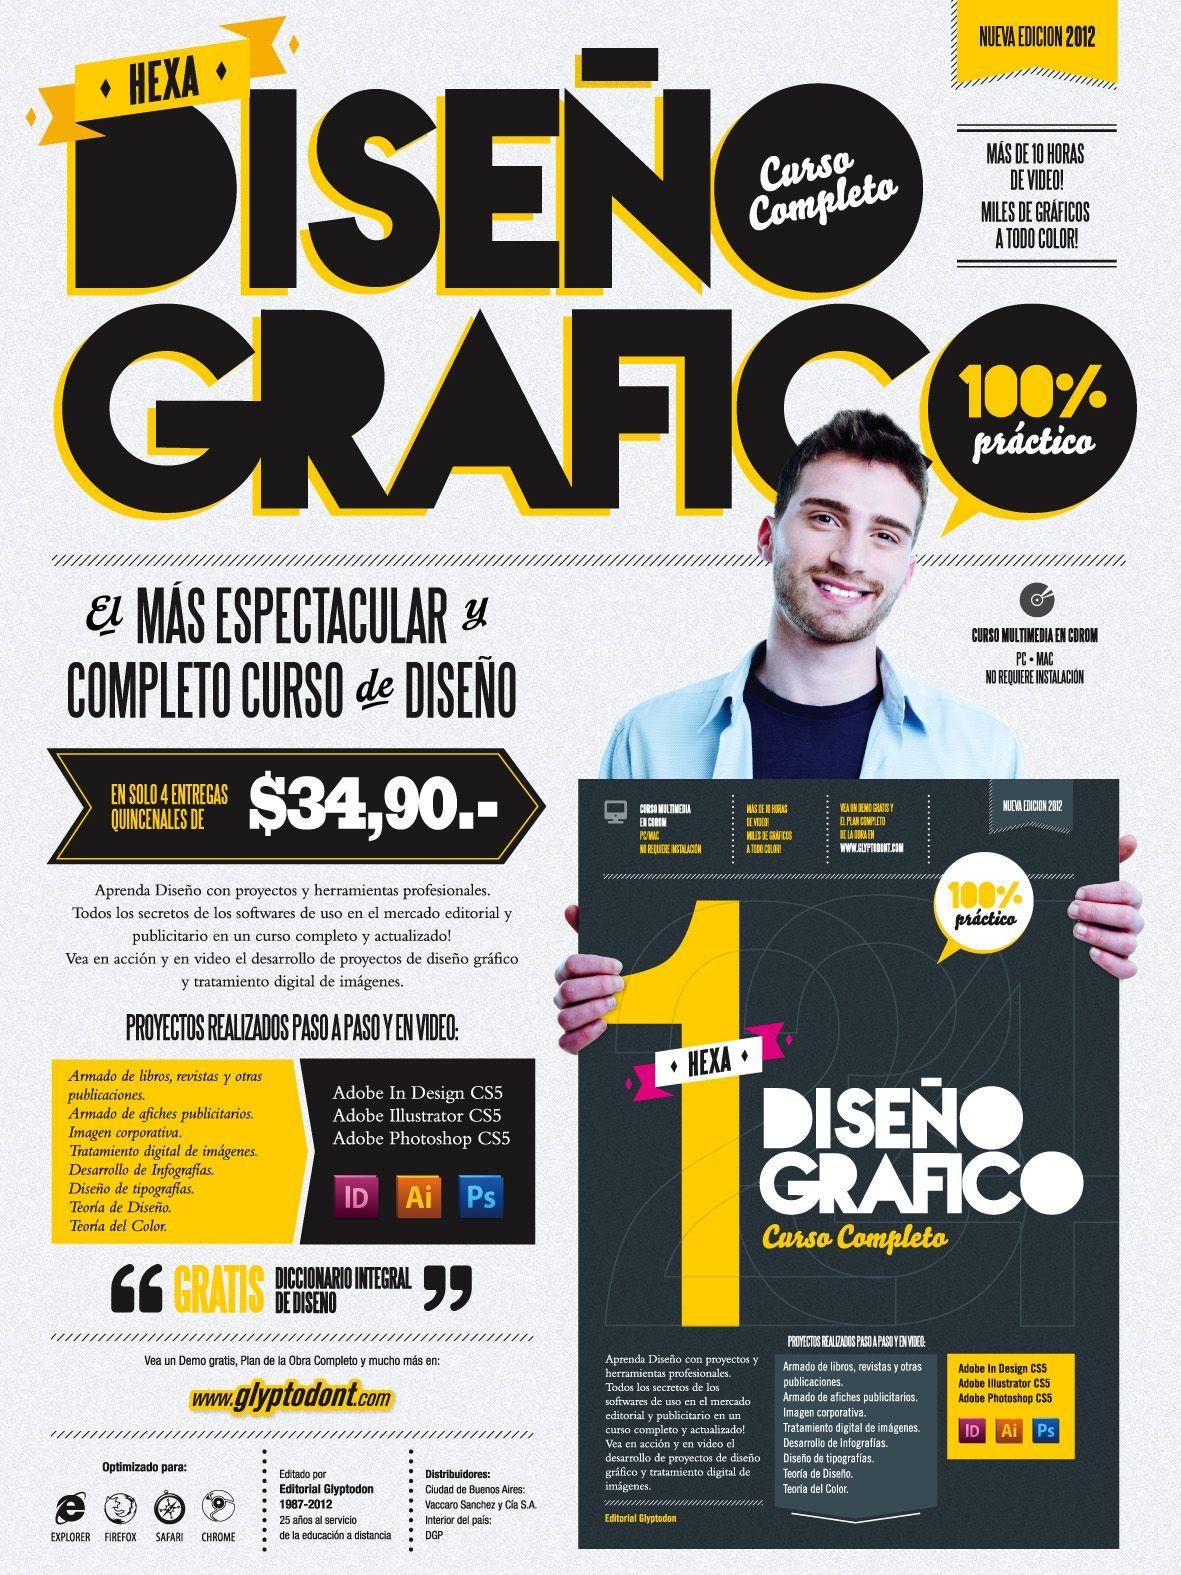 Diseño Grafico.. @Olinia OS #CreandoSoluciones   Diseño   Pinterest ...